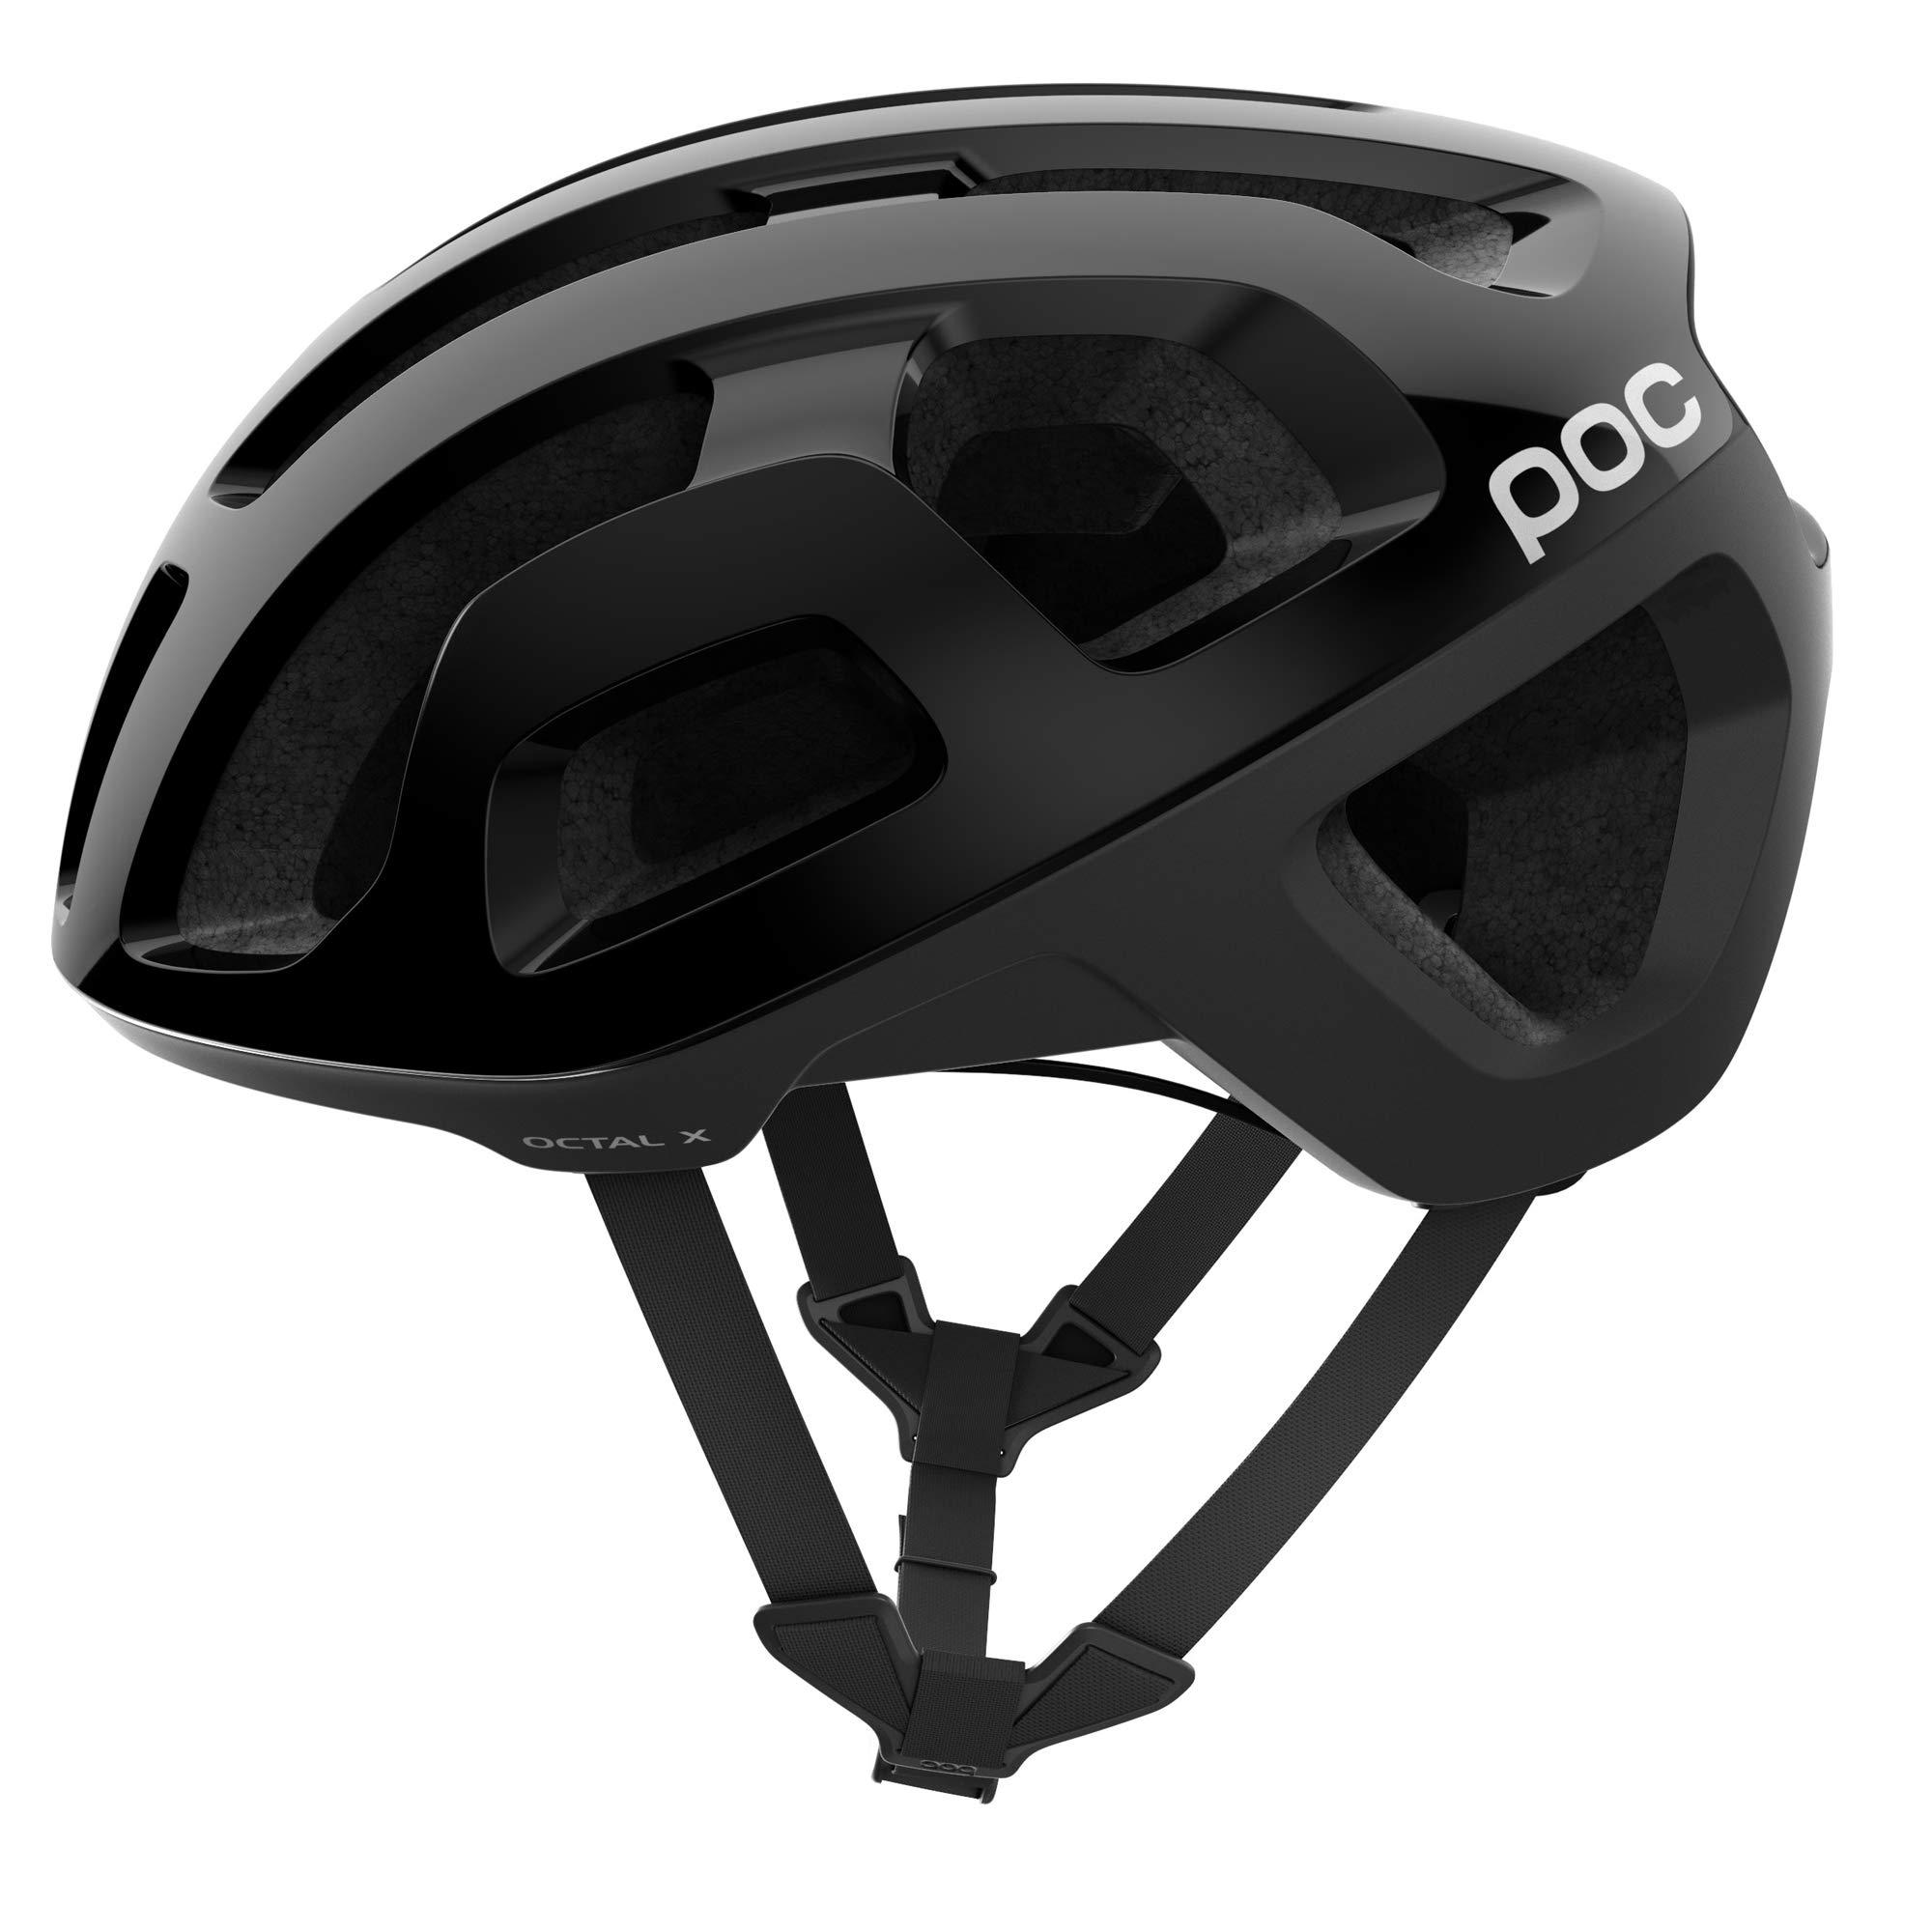 POC Octal, Helmet for Road Biking, Hydrogen, Uranium Black, S